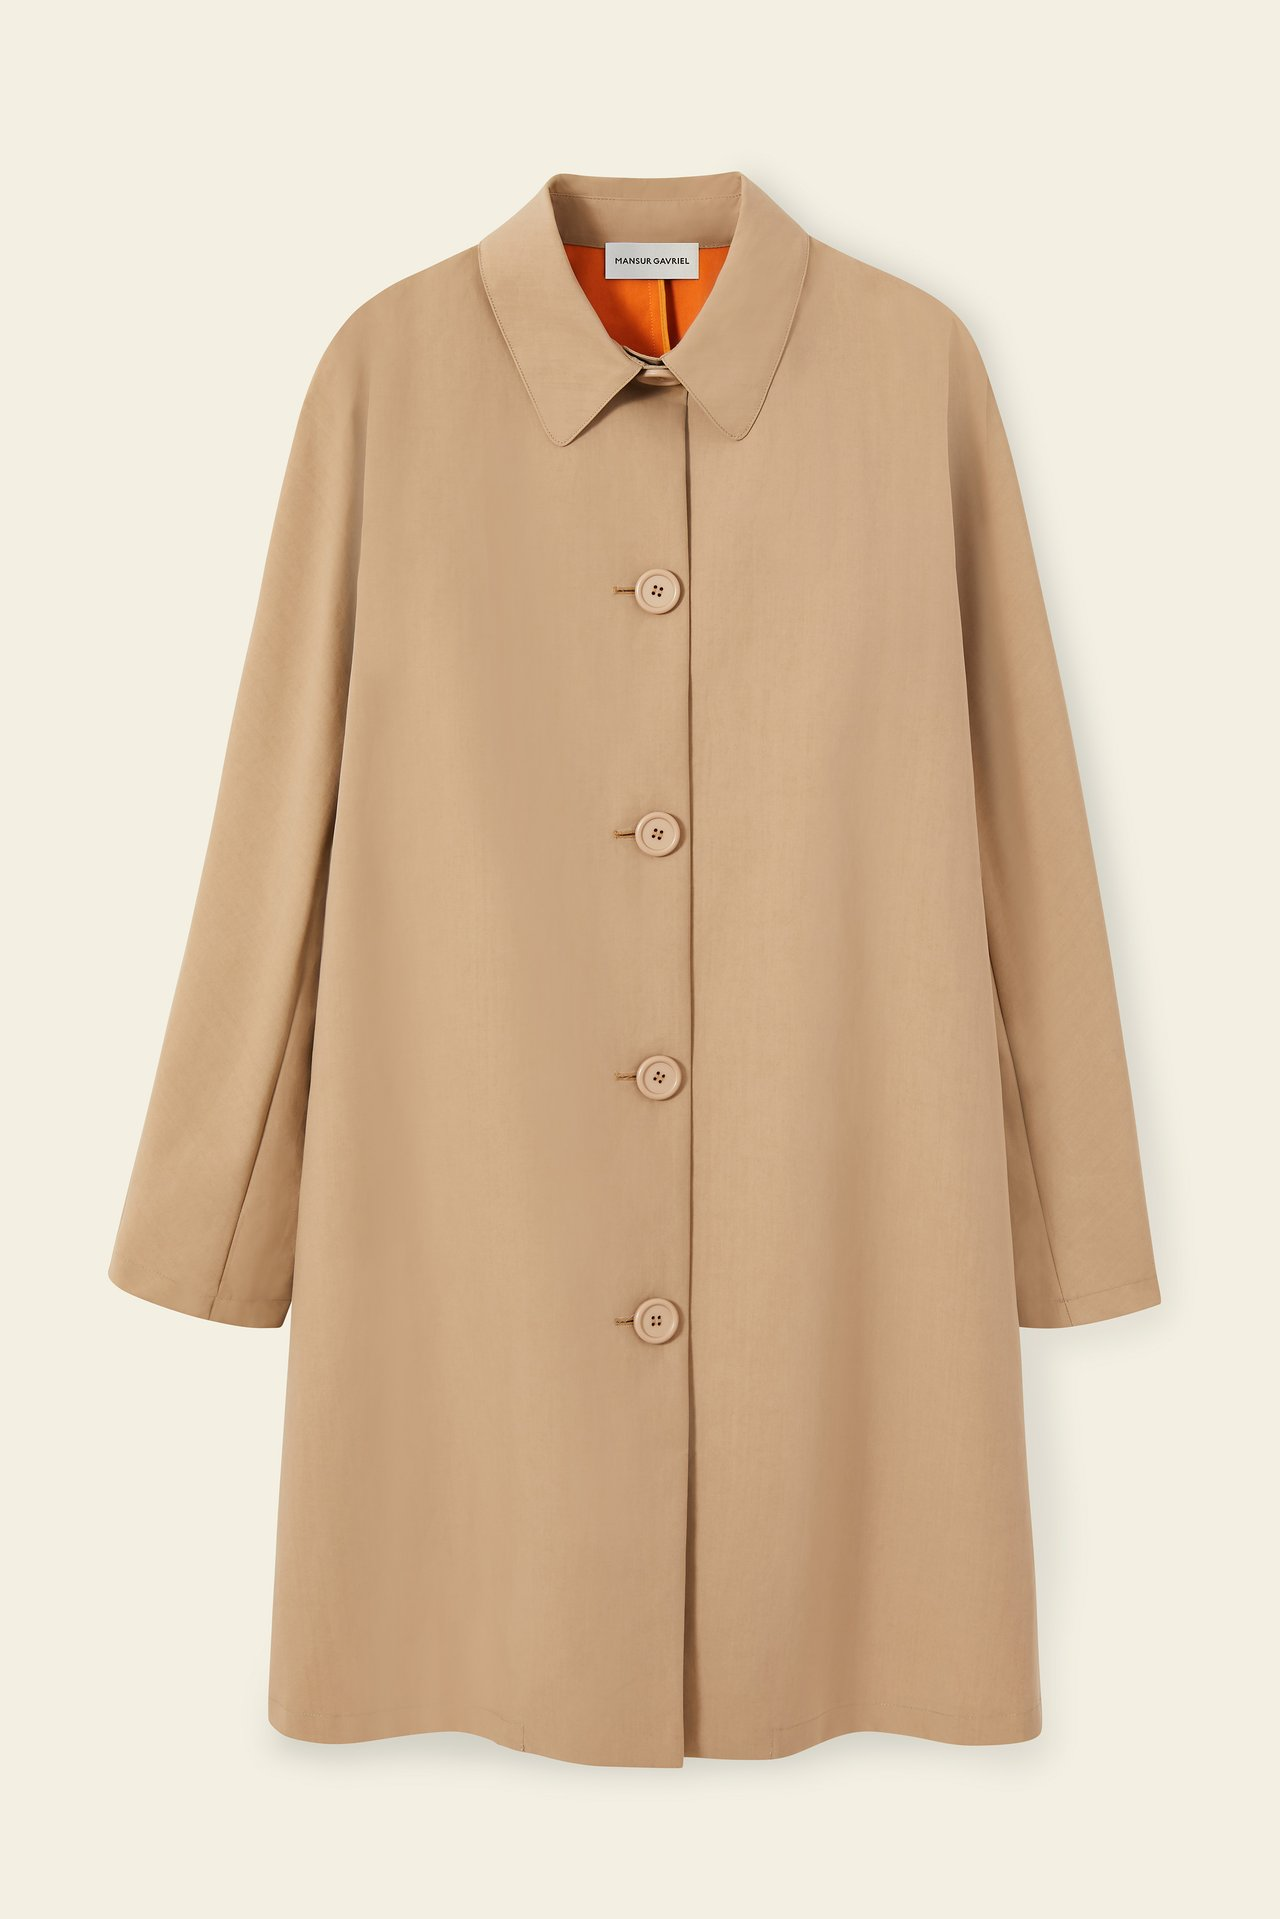 Cotton_Elegant_Coat_Bicolor_Cammello_Orange_DETAIL_99_181016_1280x.jpg